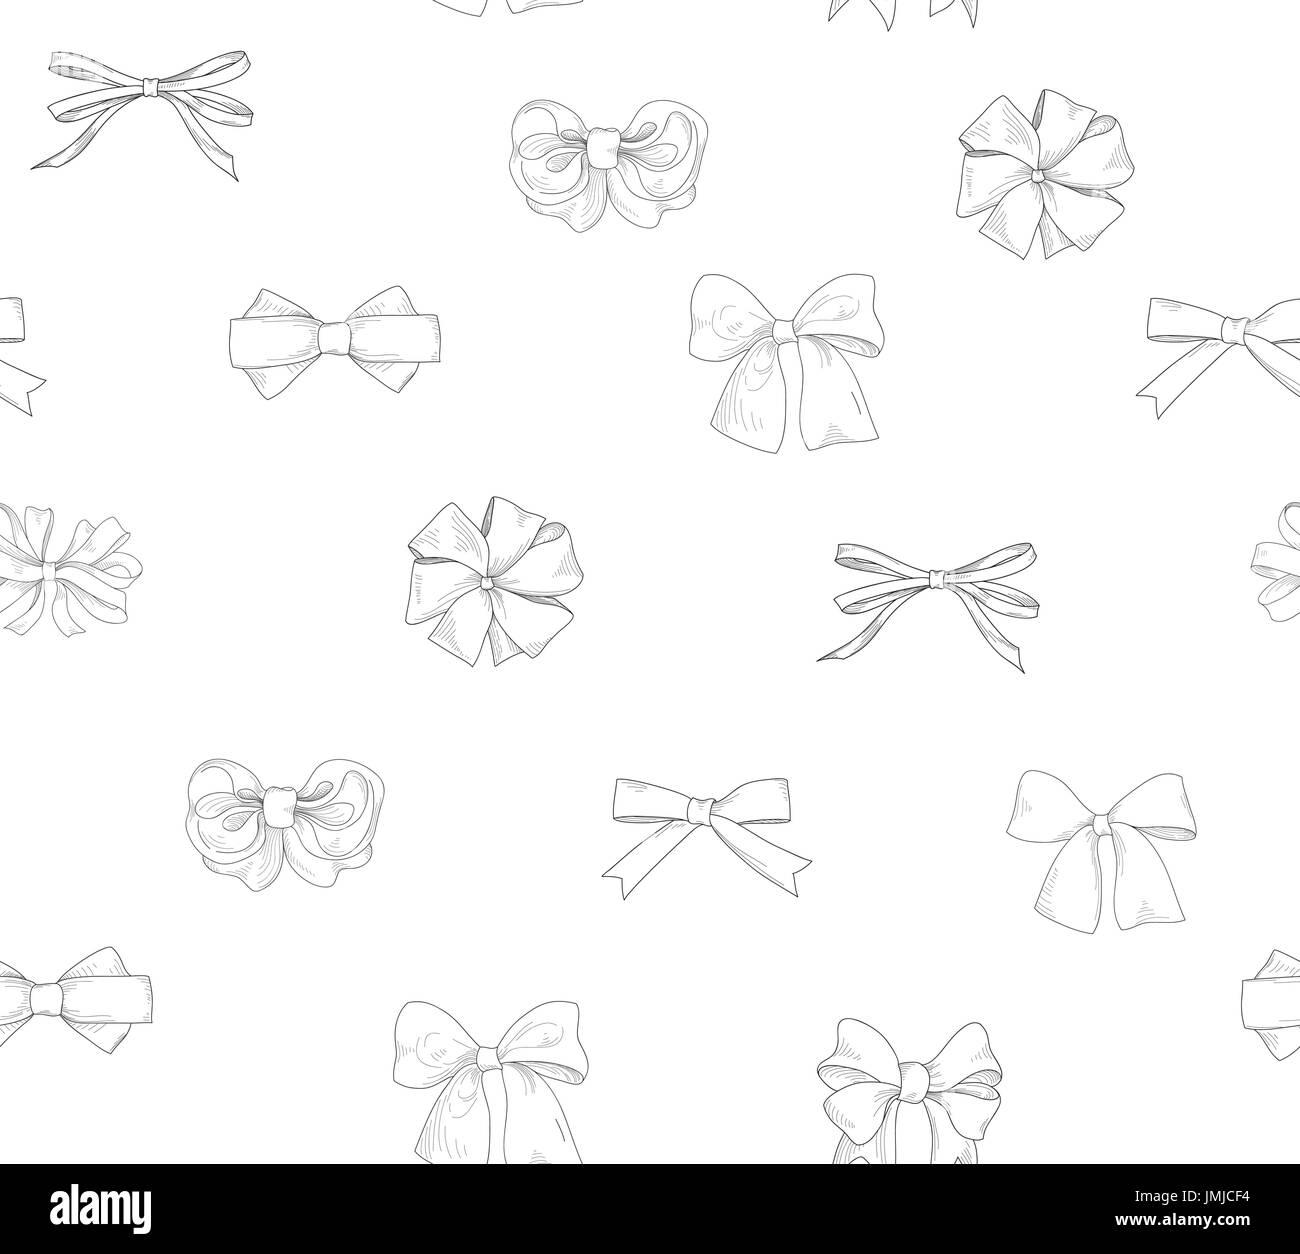 Bride Team Bow Icon Set Holiday Gift Wallpaper Fashion White Background